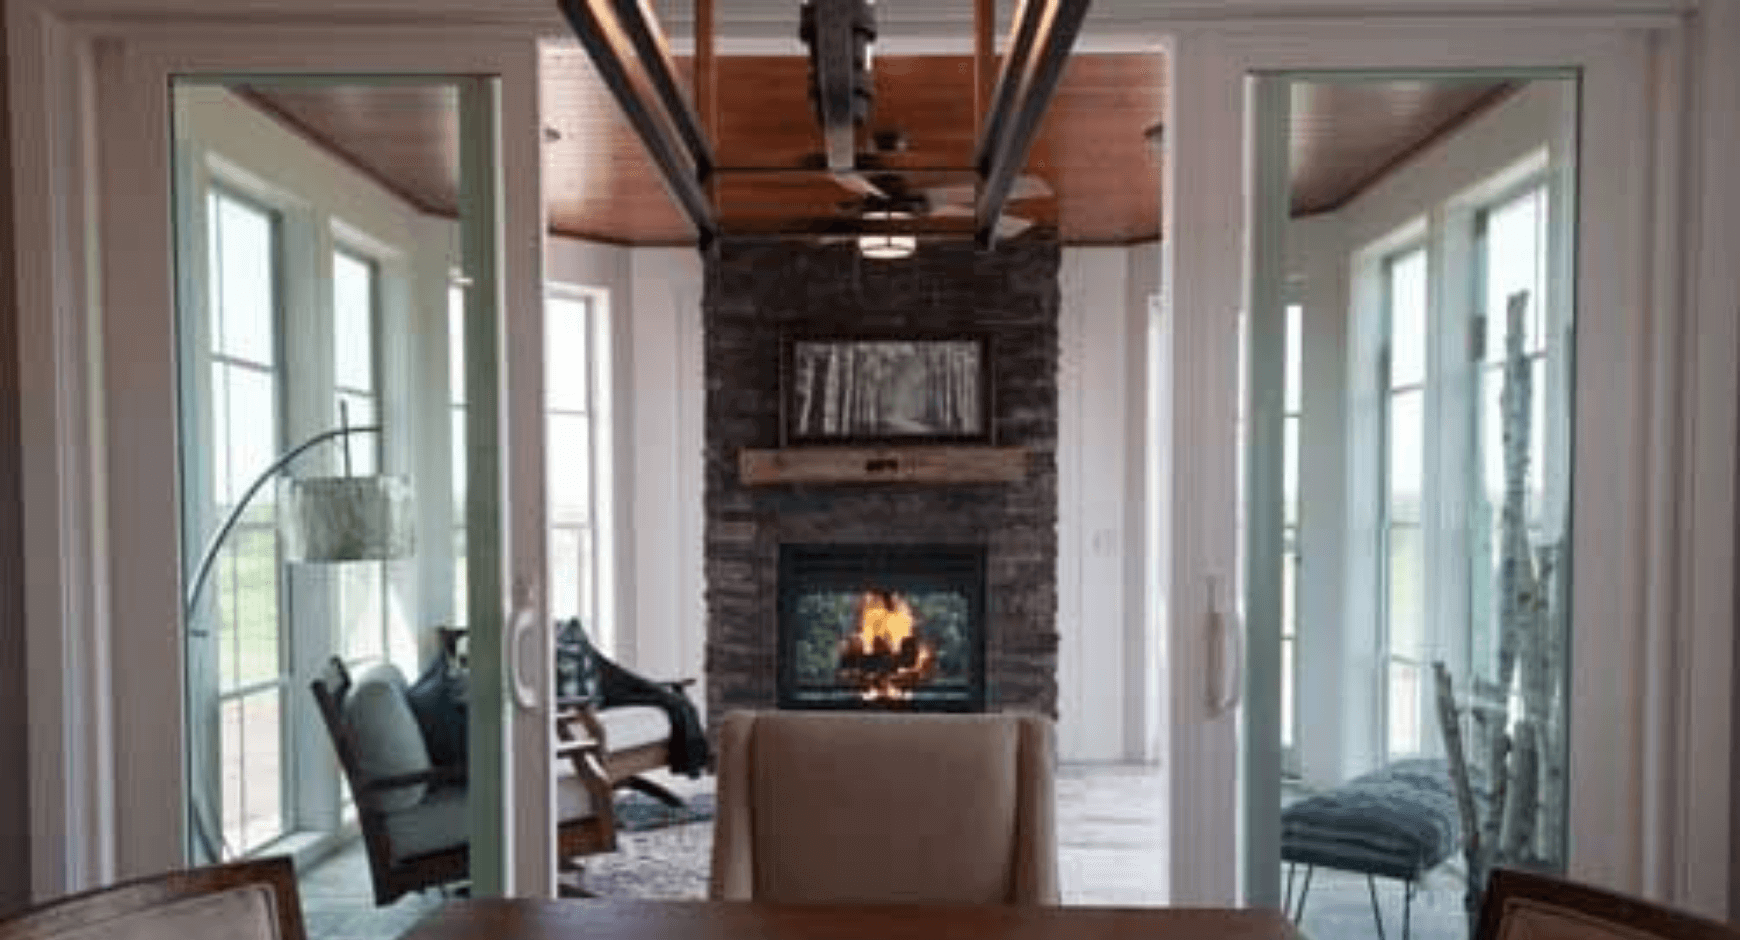 Modern 3 Season Room With a Beautiful Stone Fireplace